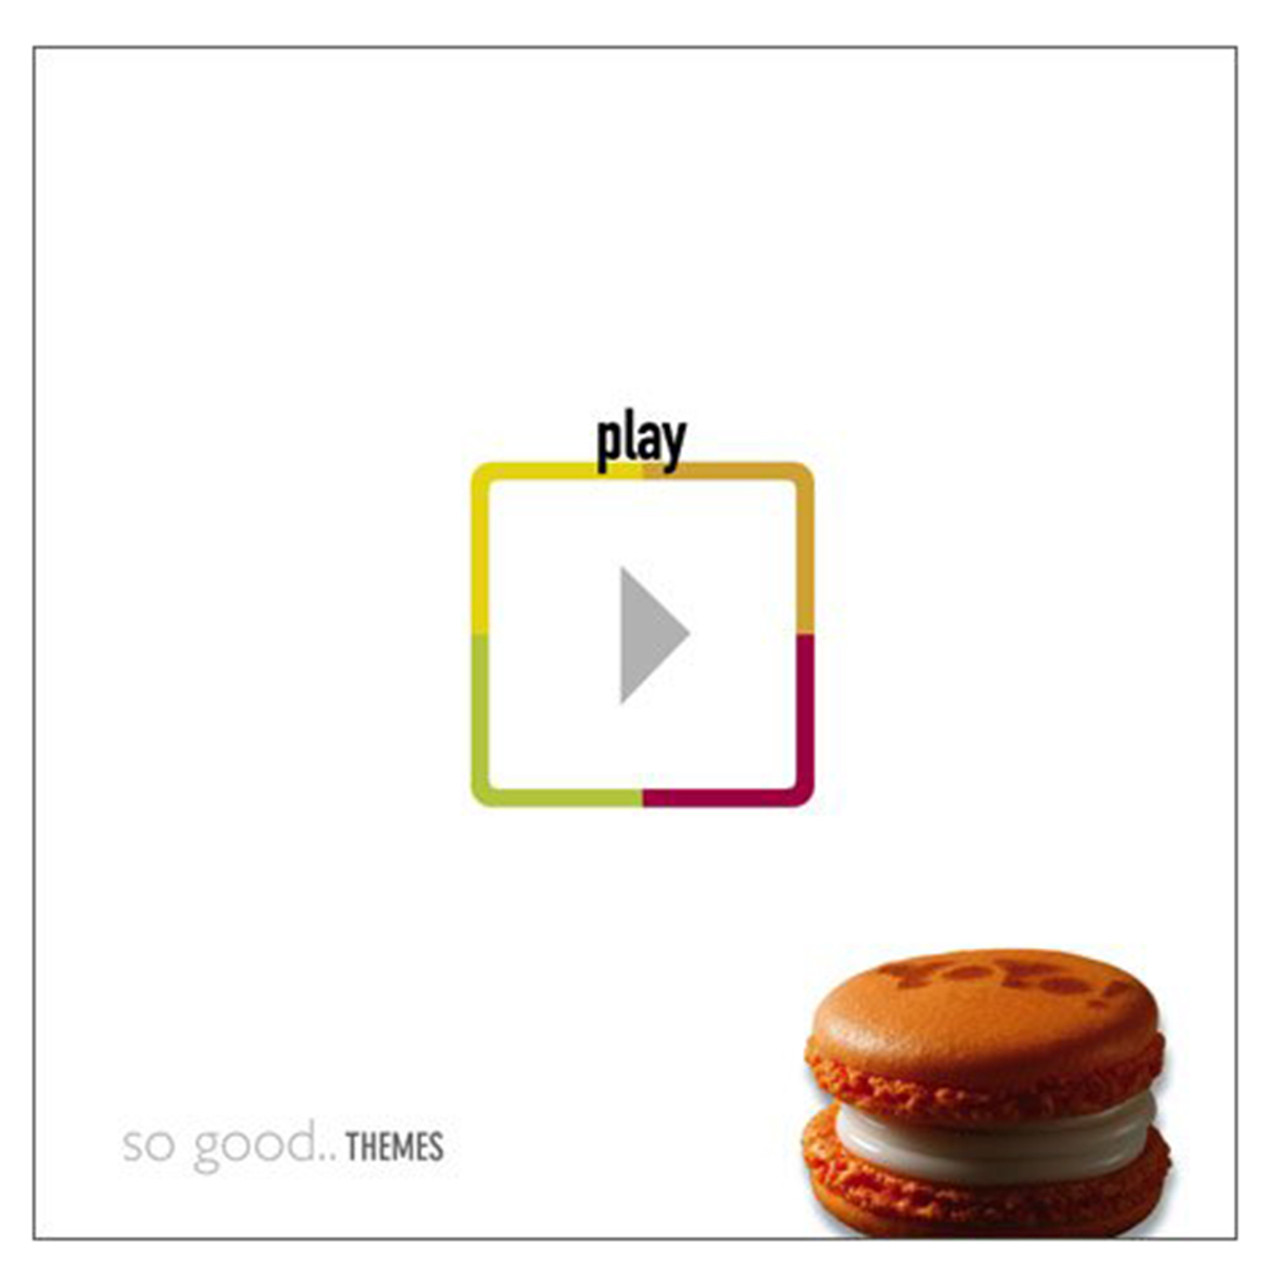 Play - So Good Themes